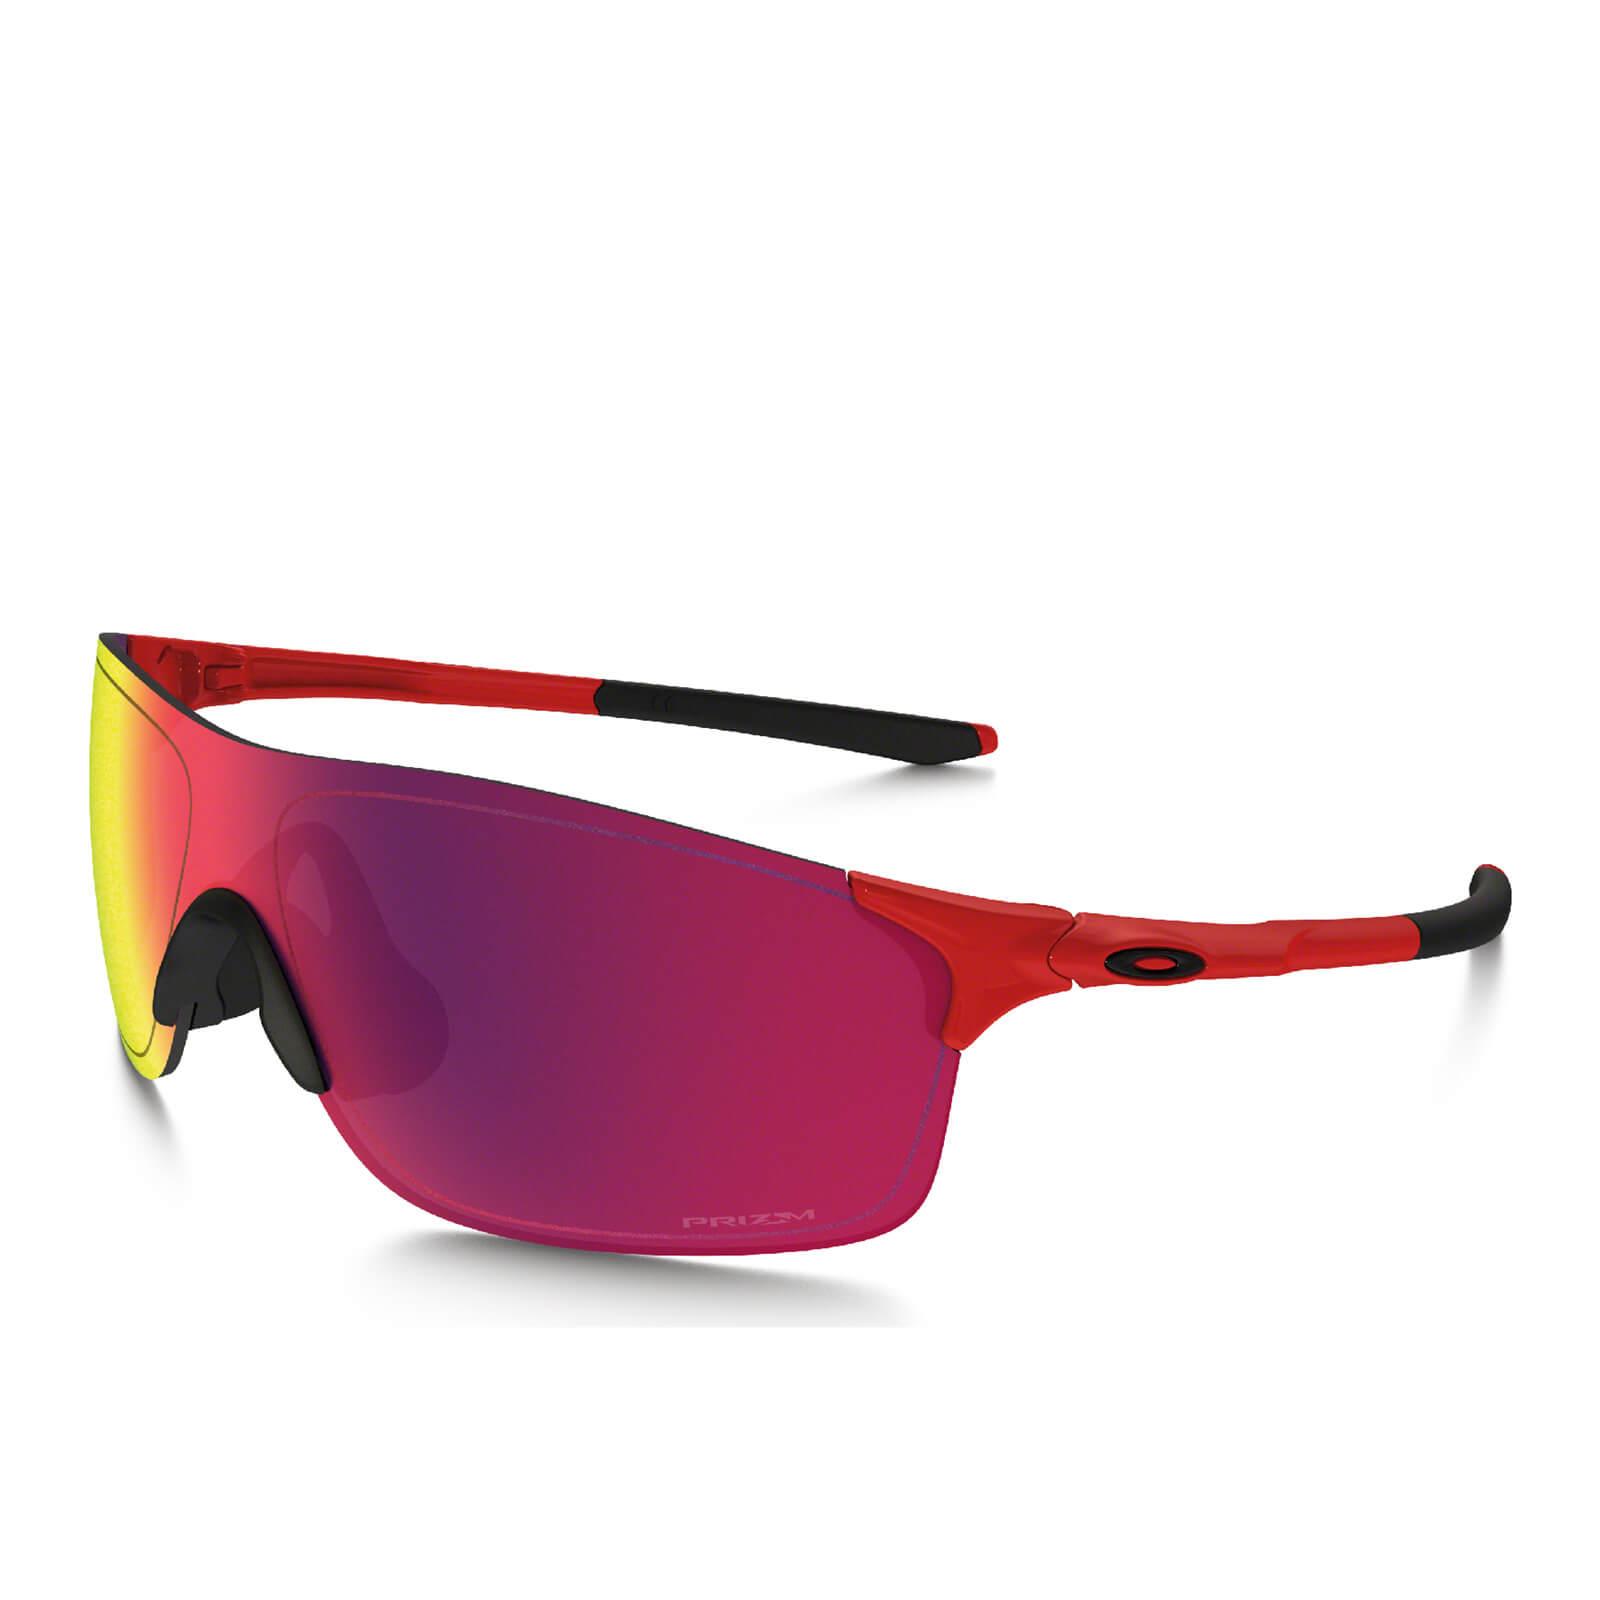 67b9dbf548 Oakley EV Zero Pitch Prizm Sunglasses - Redline Prizm Road